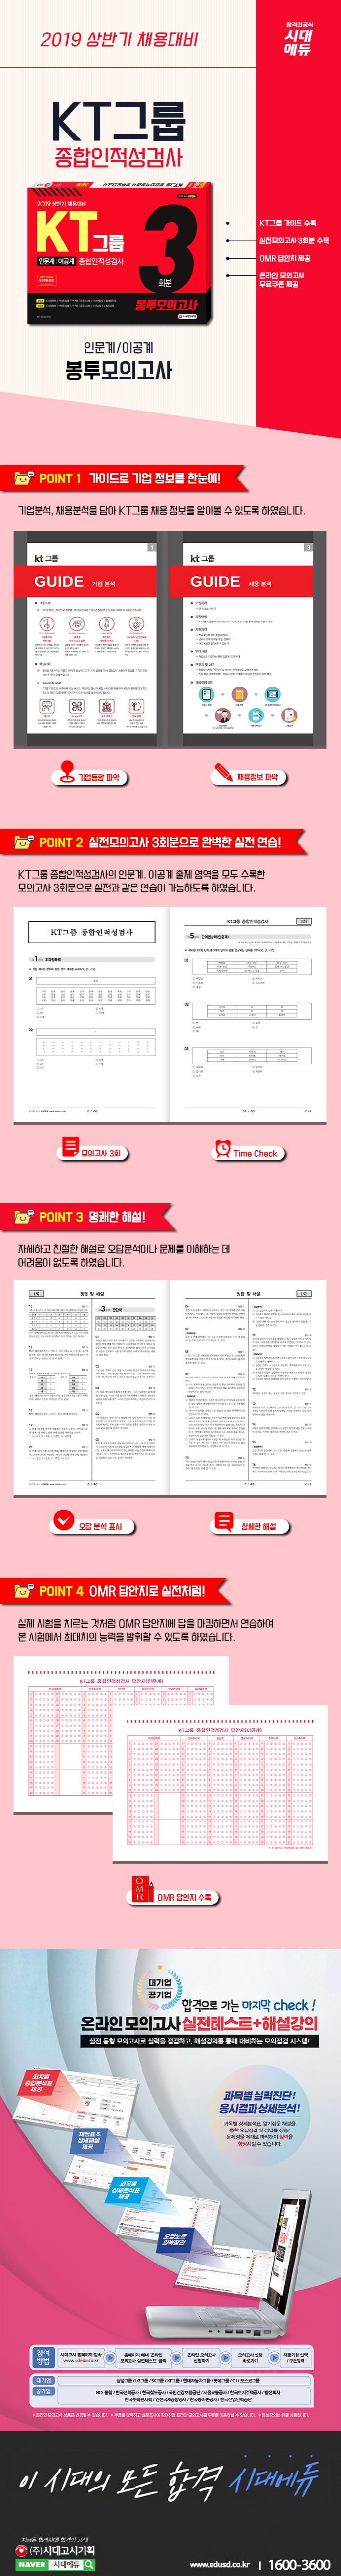 KT그룹 종합인적성검사(인문계.이공계) 봉투모의고사 3회분(2019 상반기)(시대에듀) 도서 상세이미지